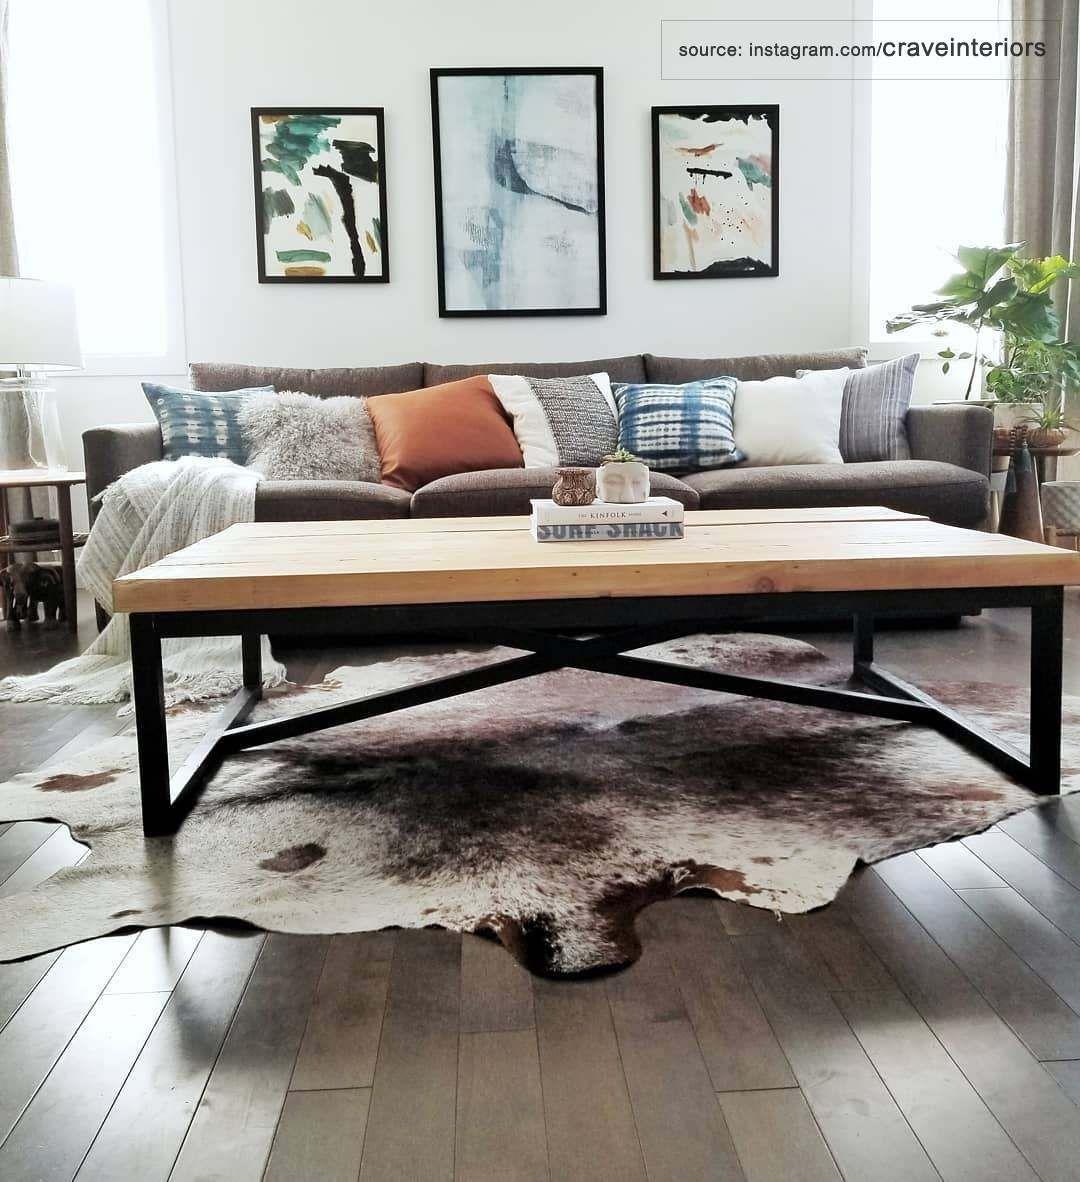 Surprising home decorative items designs